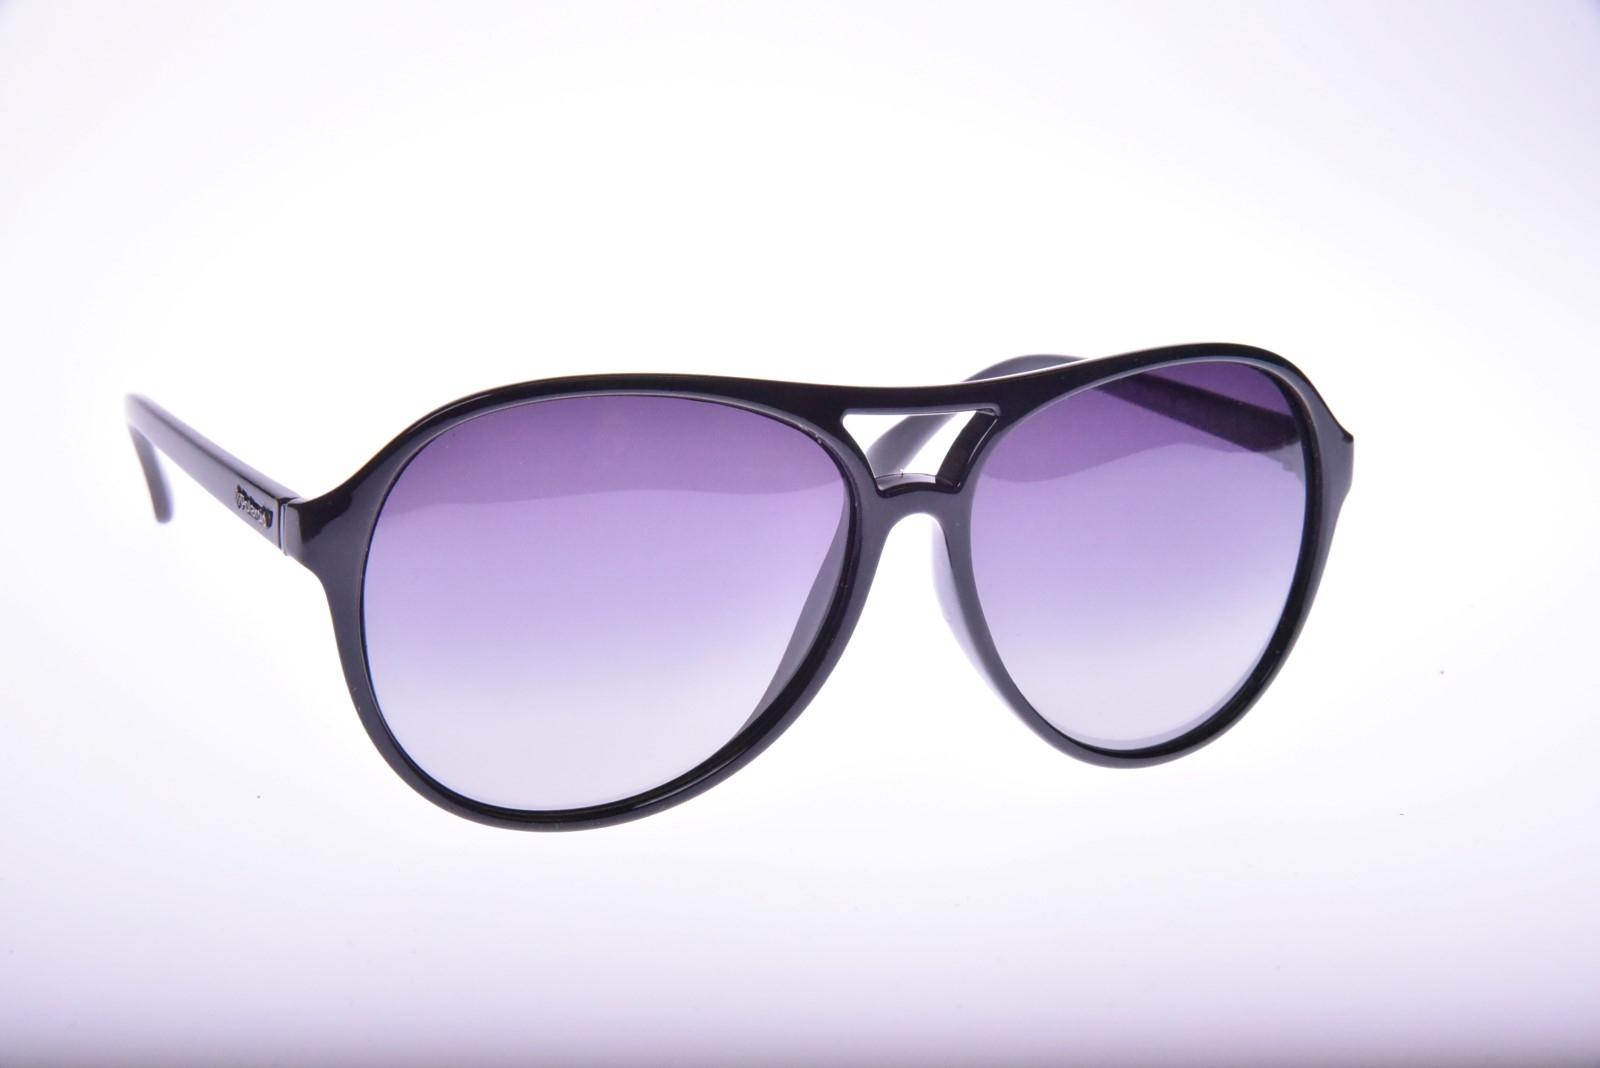 Polaroid Superior F8212A - Unisex slnečné okuliare